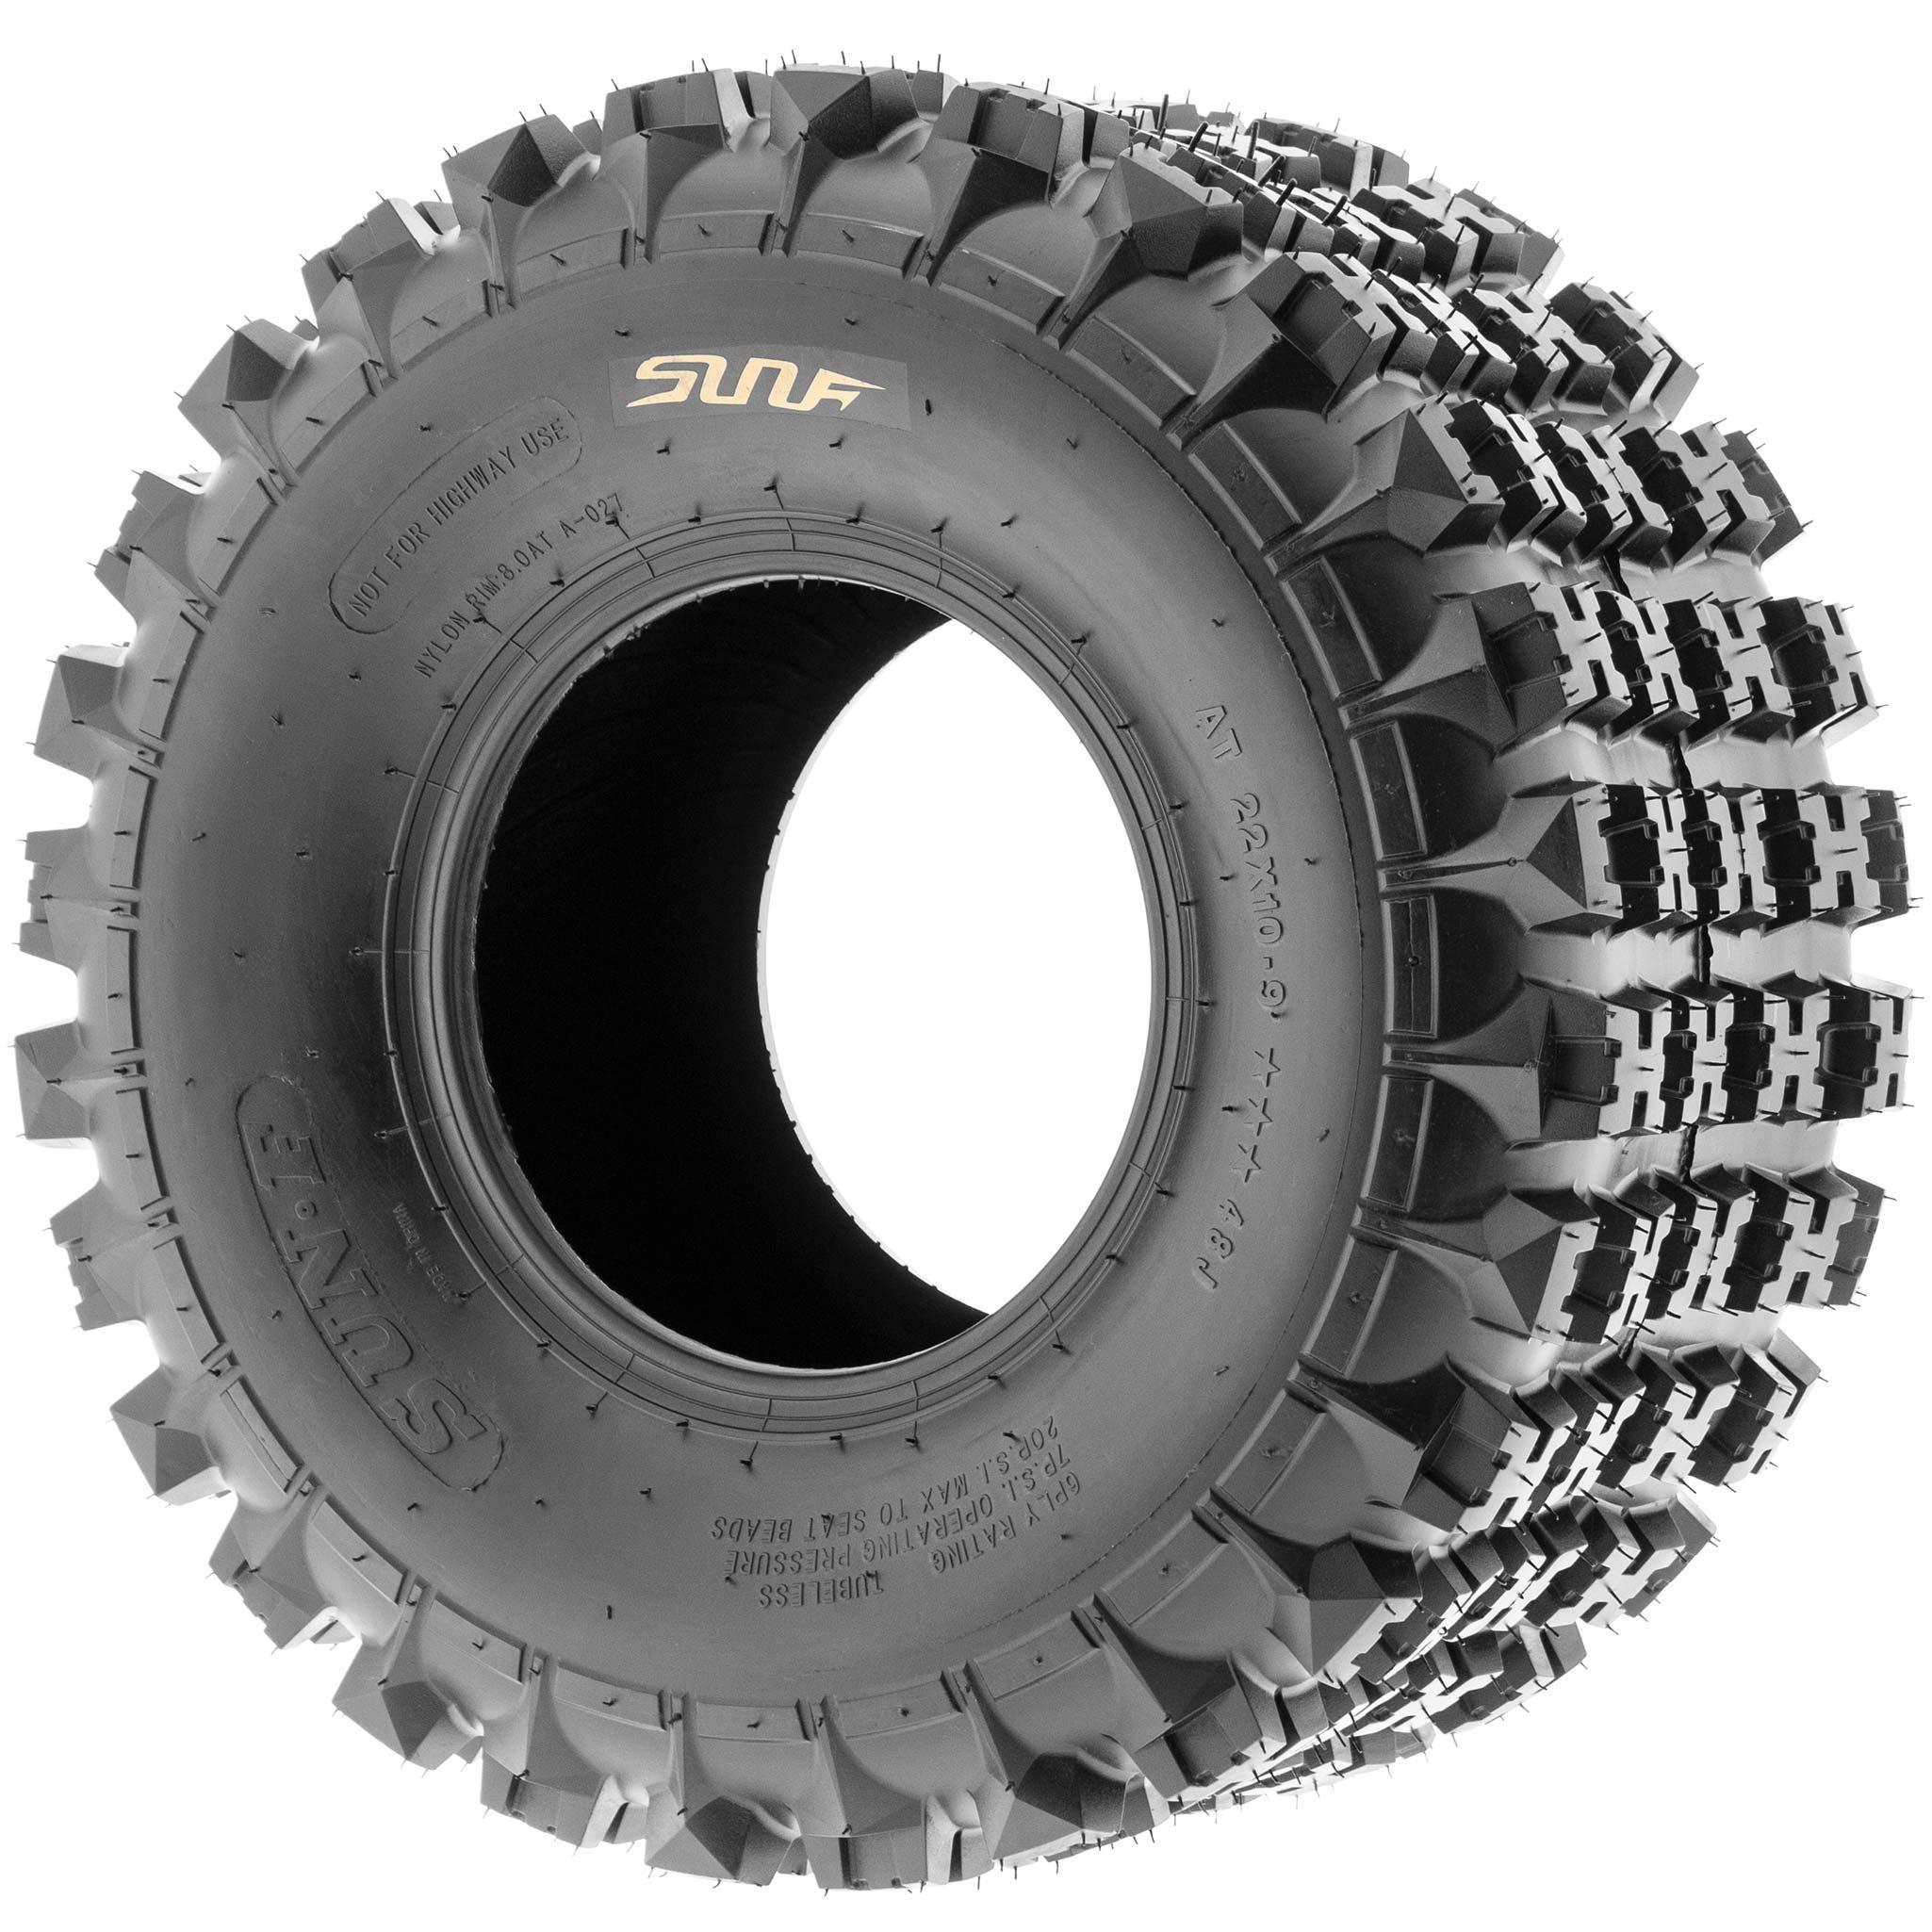 SunF 18x10.5-8 18x10.5x8 ATV UTV All Terrain Race Replacement 6 PR Tubeless Tires A027, [Set of 2] by SunF (Image #4)